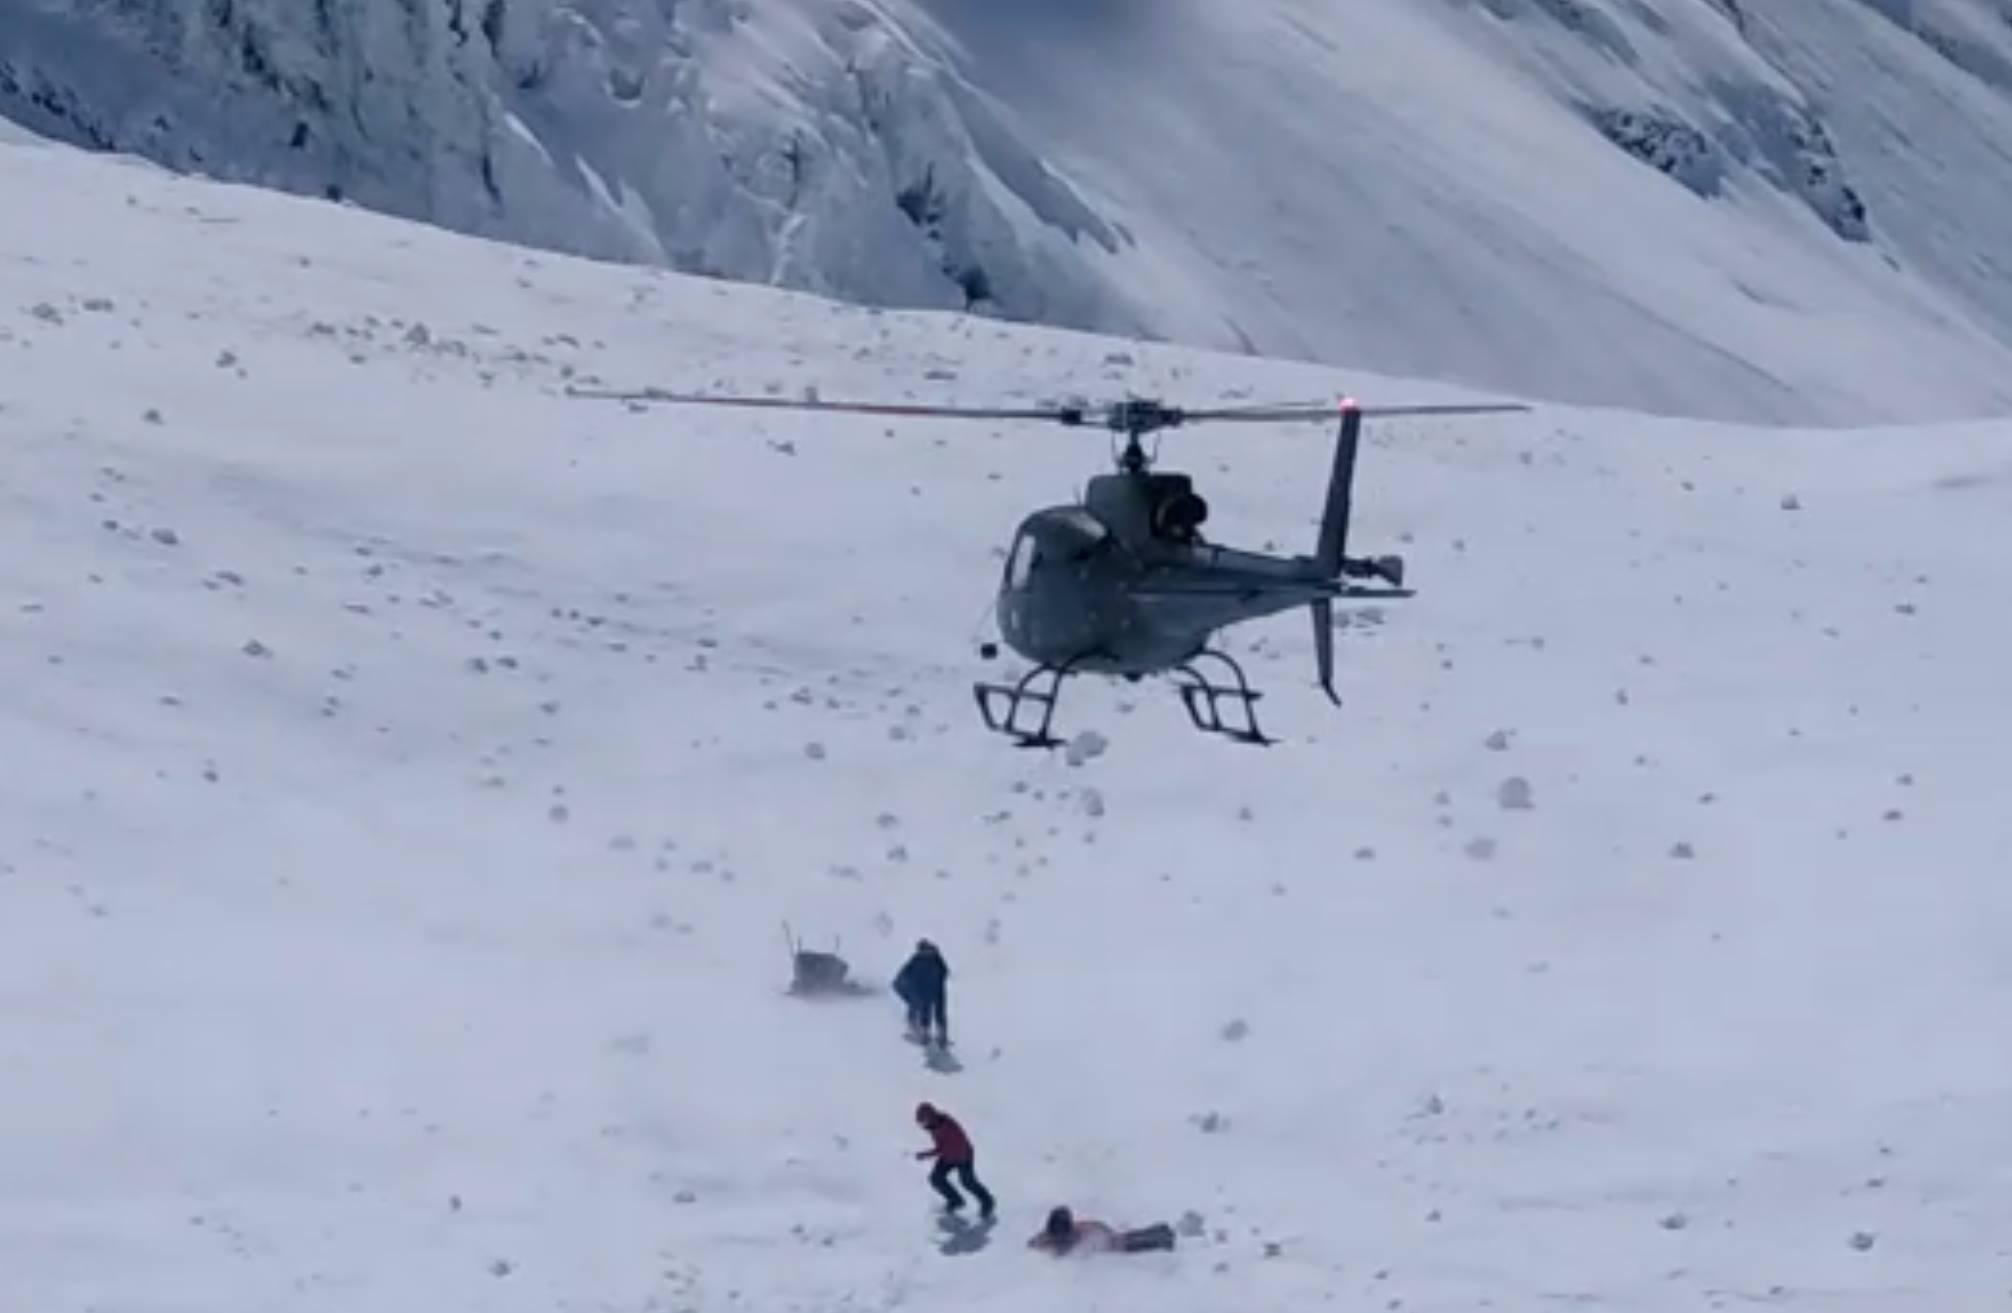 Alex Txikon, daniele nardi, Tom Ballard, Nanga Parbat, Alpinismo,